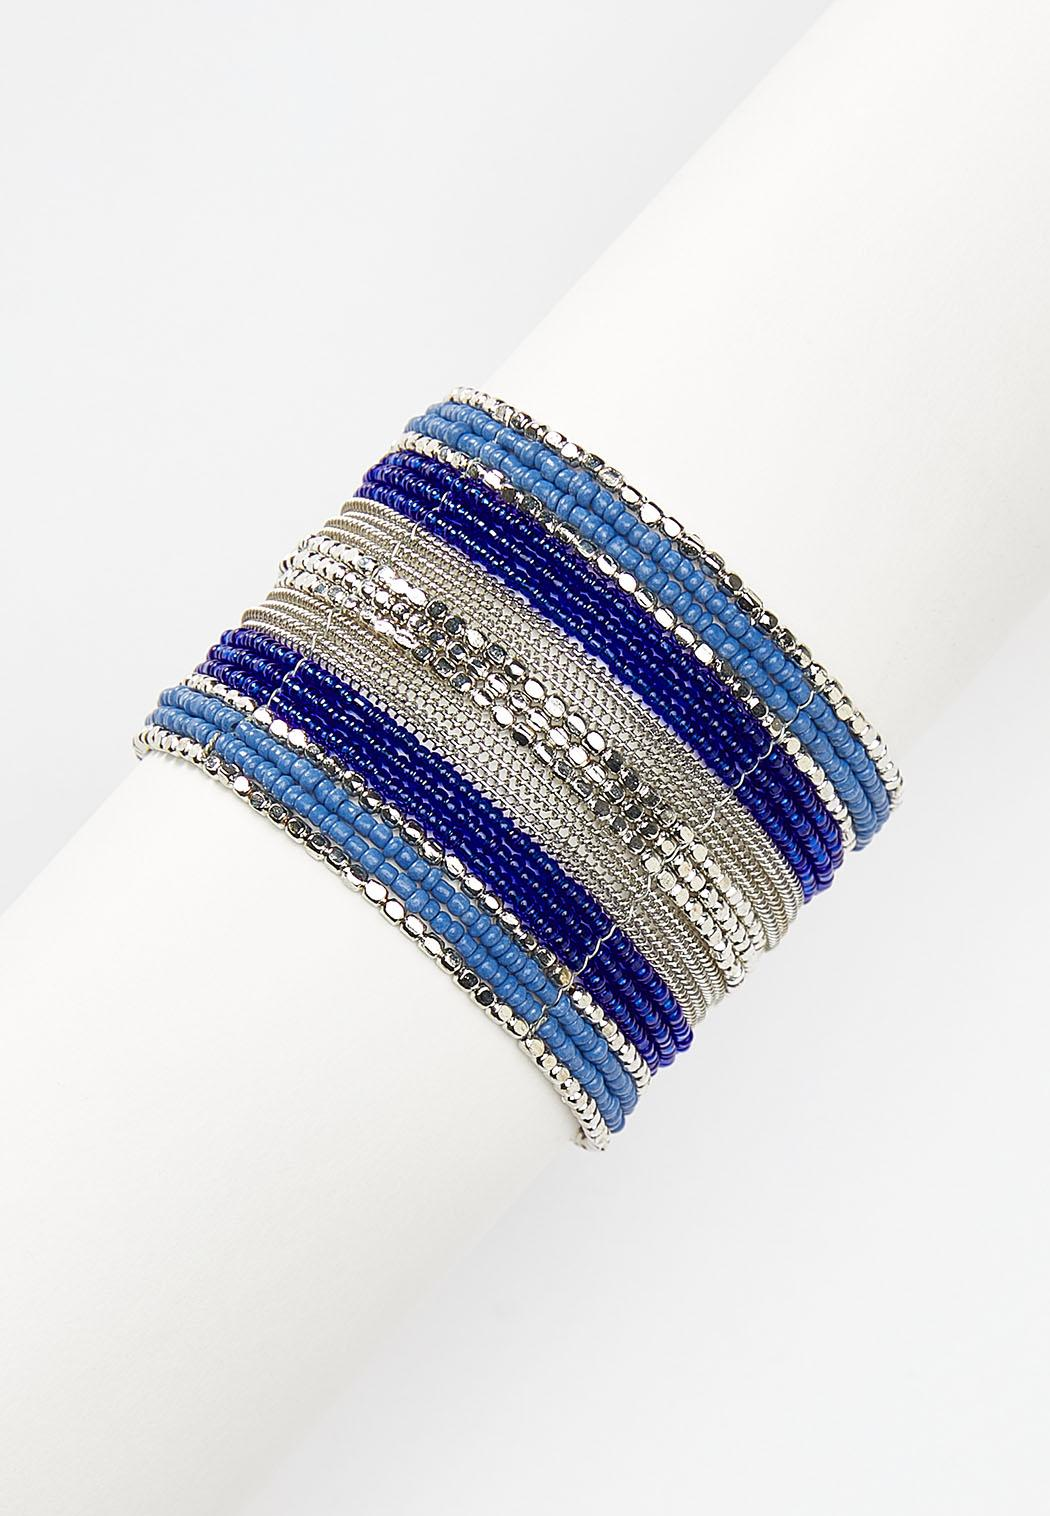 Blue Seed Bead Cuff Bracelet